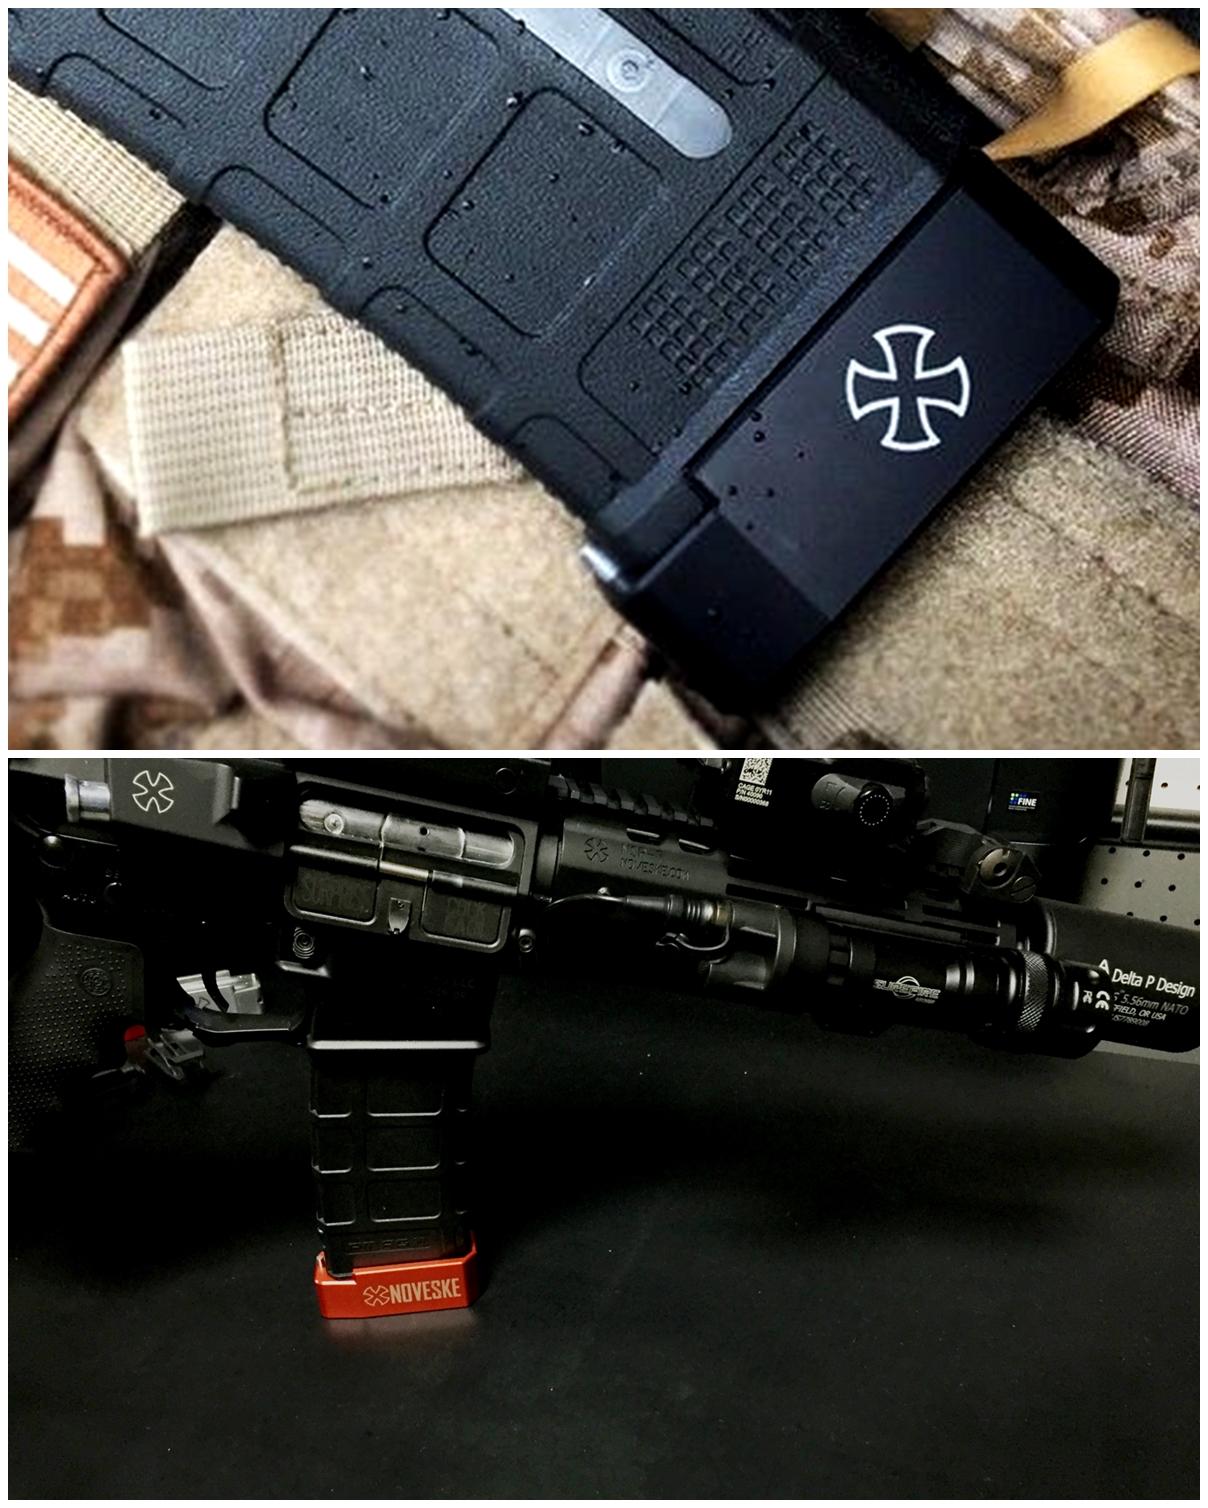 12 UAC P-MAG TTI TYPE アルミ ベース パッド 追加 購入 & TTI NOVESKE DIY LASER 刻印 加工 取付 レビュー